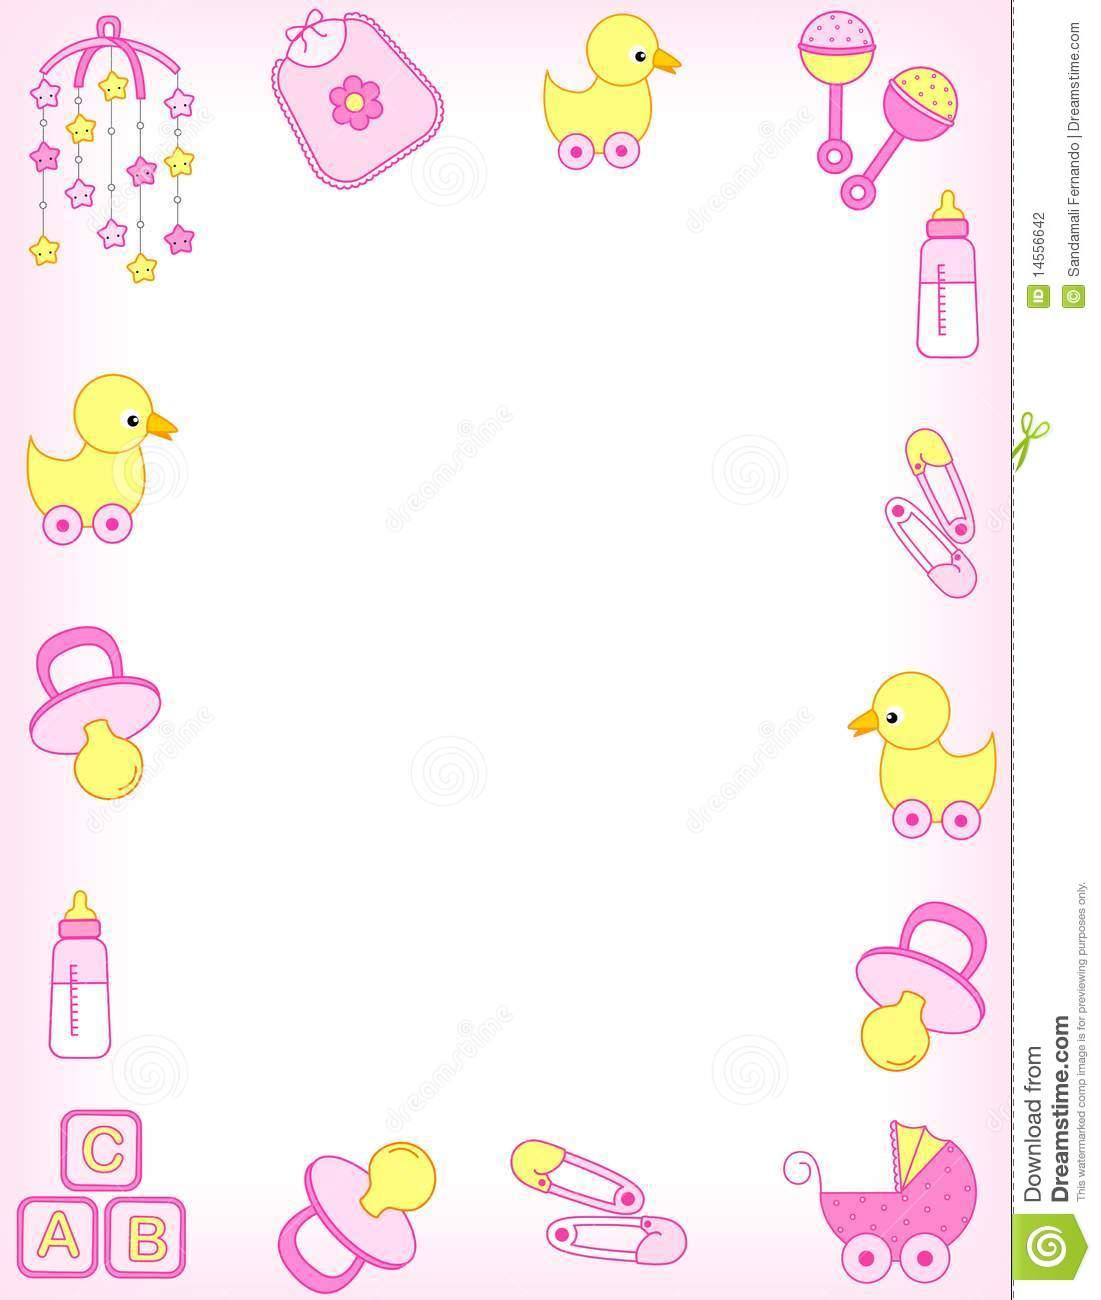 Baby girl border clipart banner transparent stock 37+ Baby Shower Border Clip Art | ClipartLook banner transparent stock